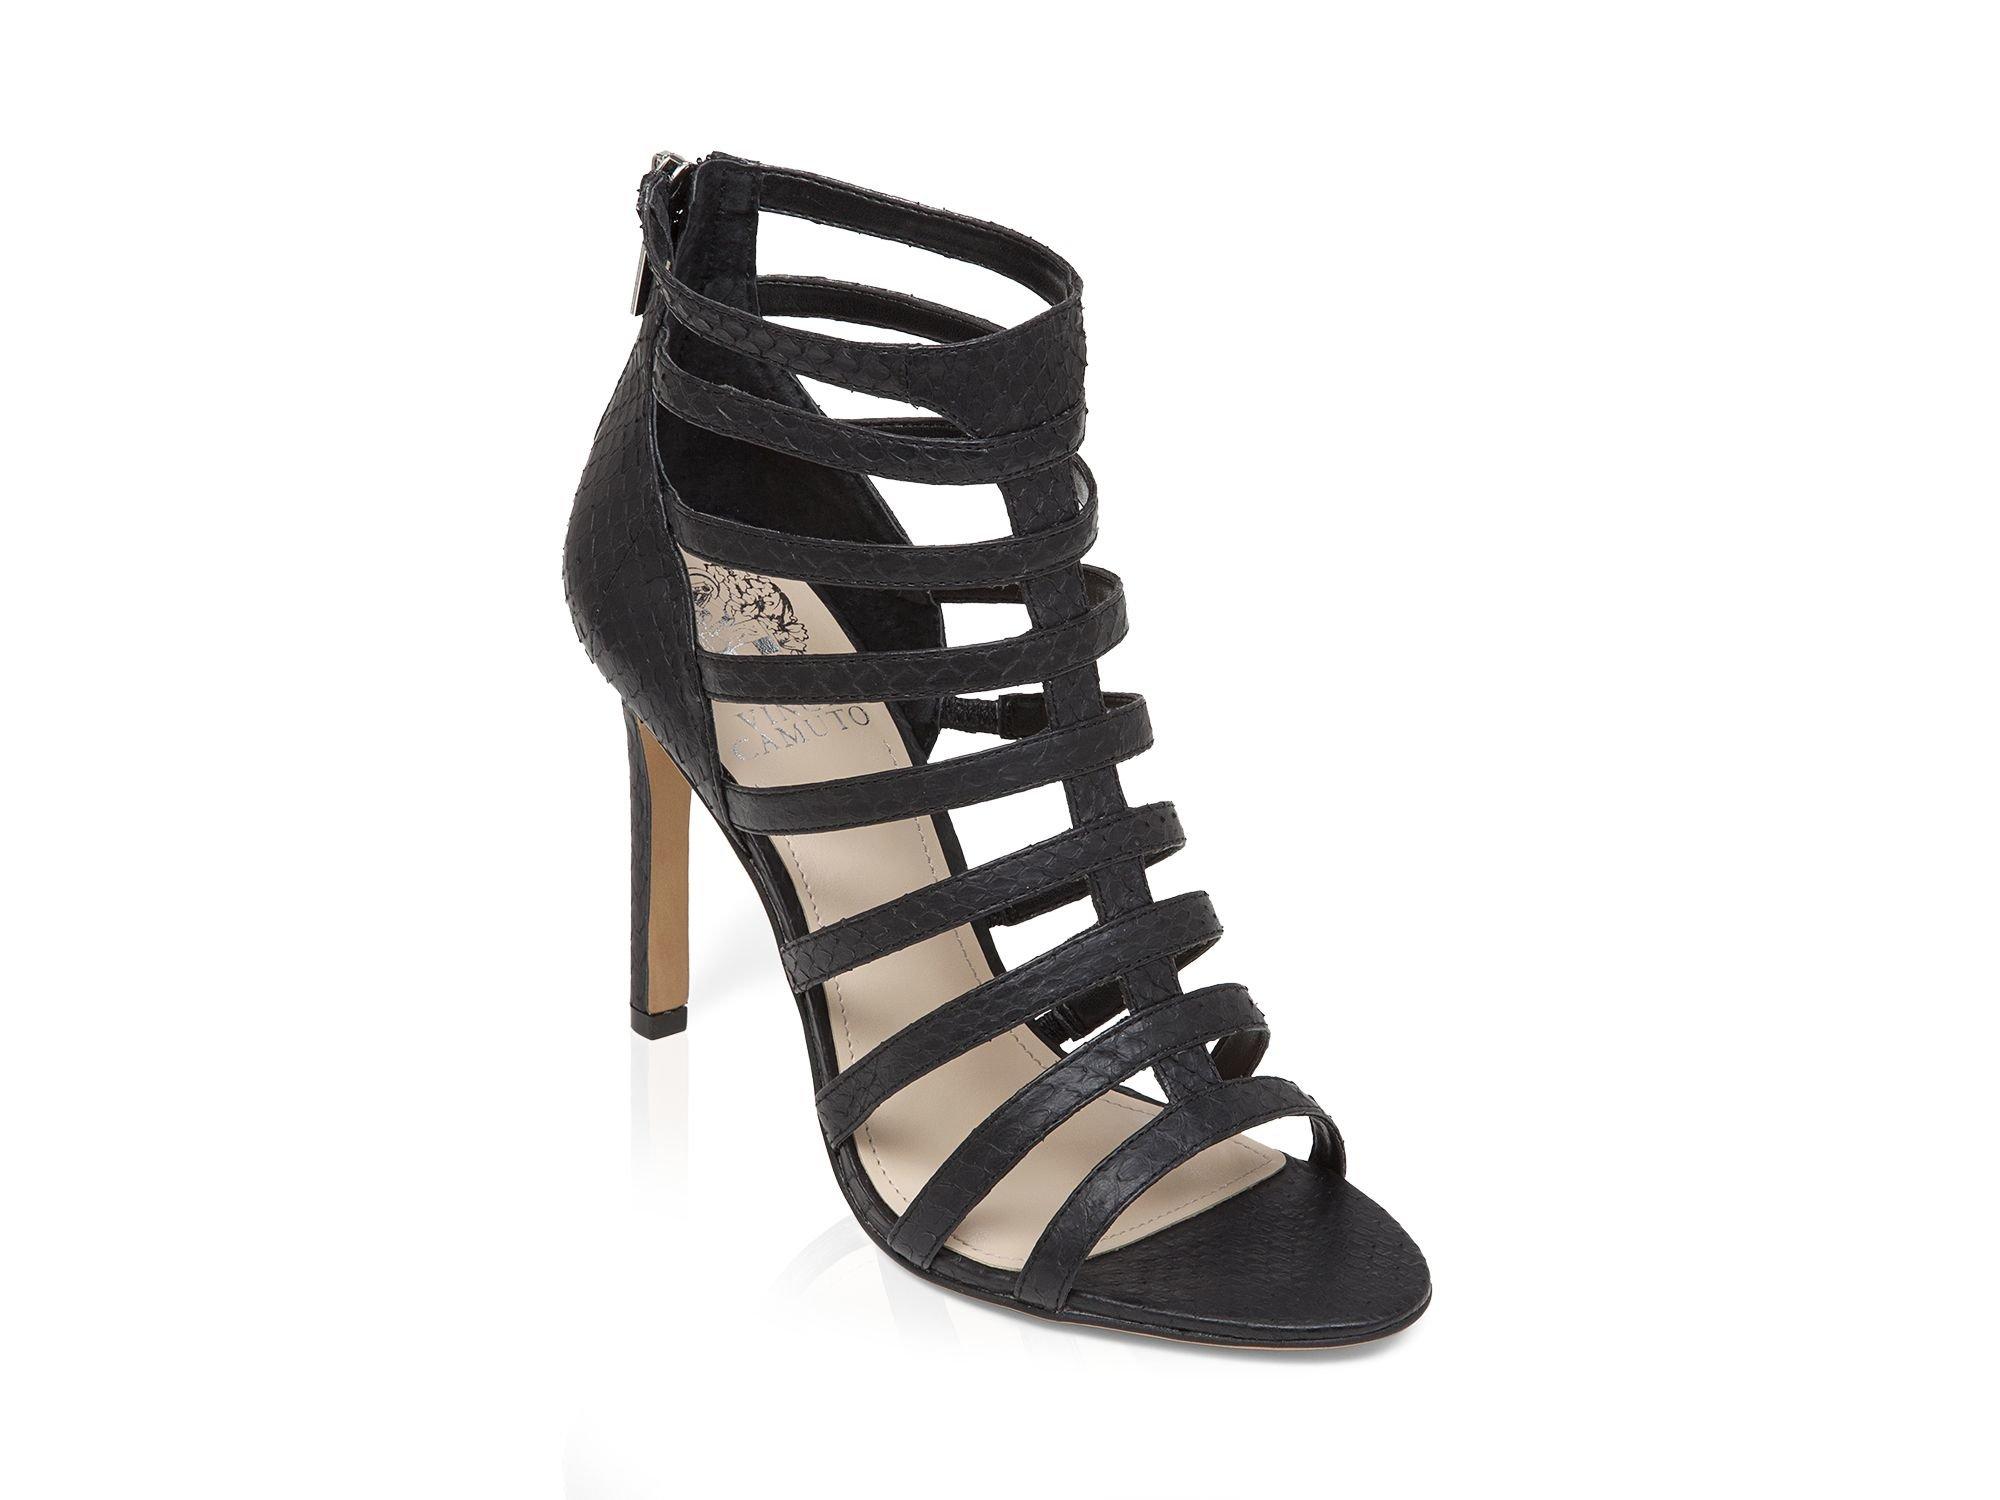 96797d09d8 Vince Camuto Open Toe Caged Gladiator Sandals - Kamella High Heel in ...